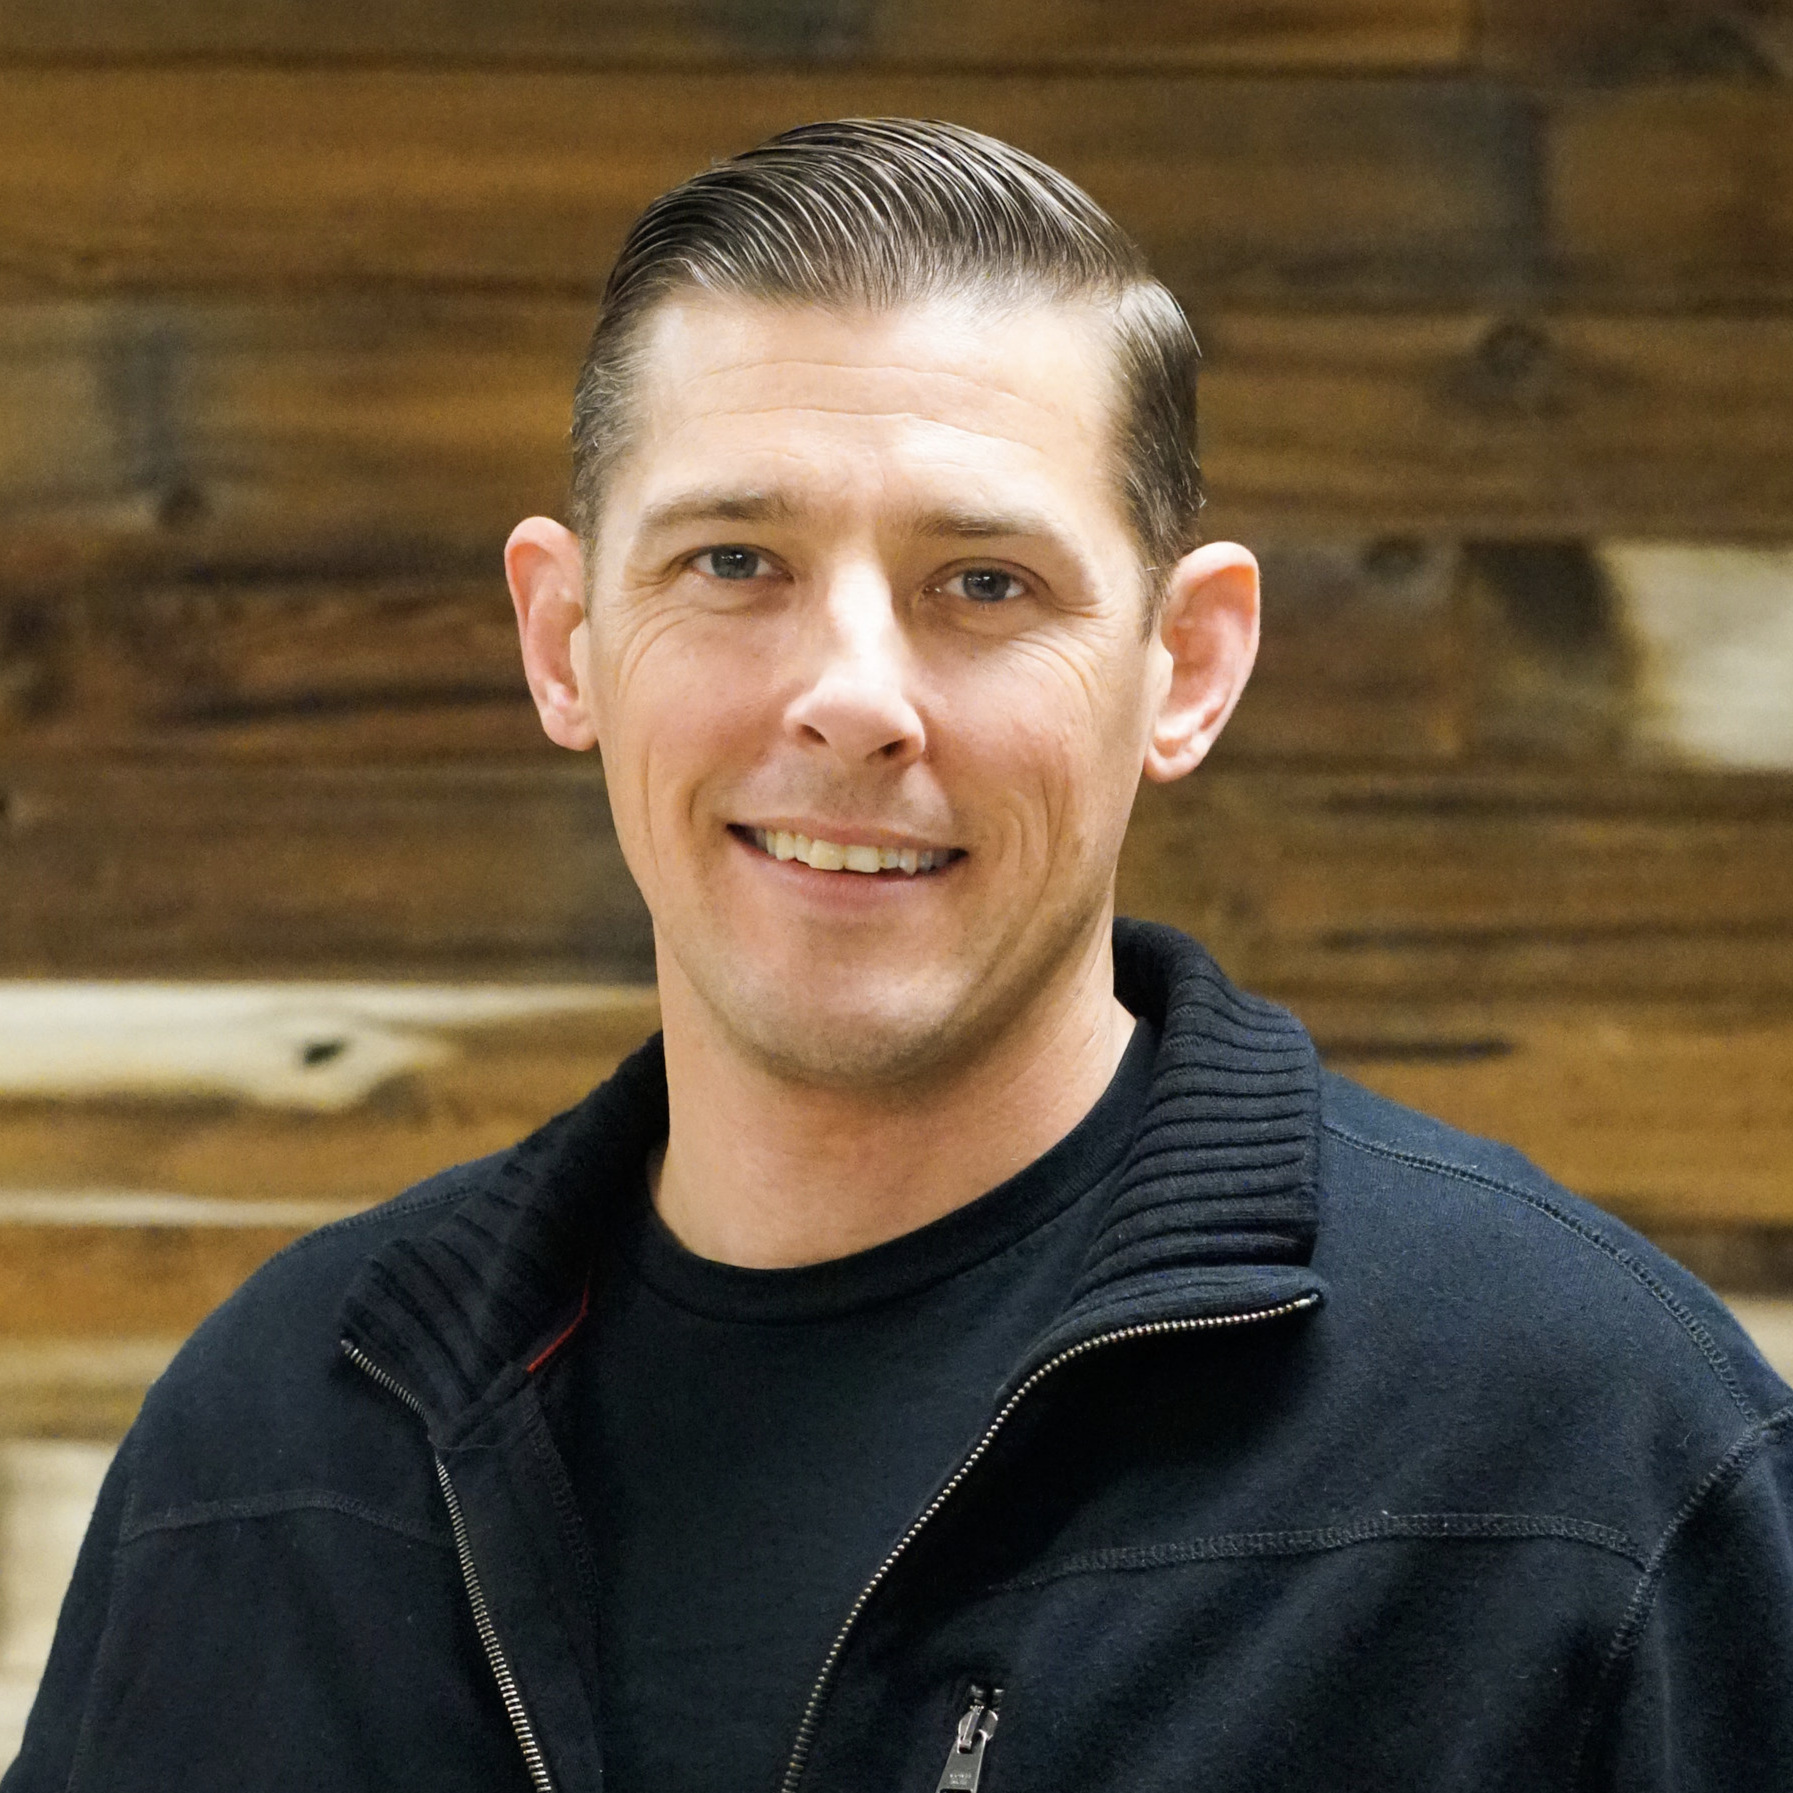 Christian Slye | Asst. Pastor, Project Mgr.